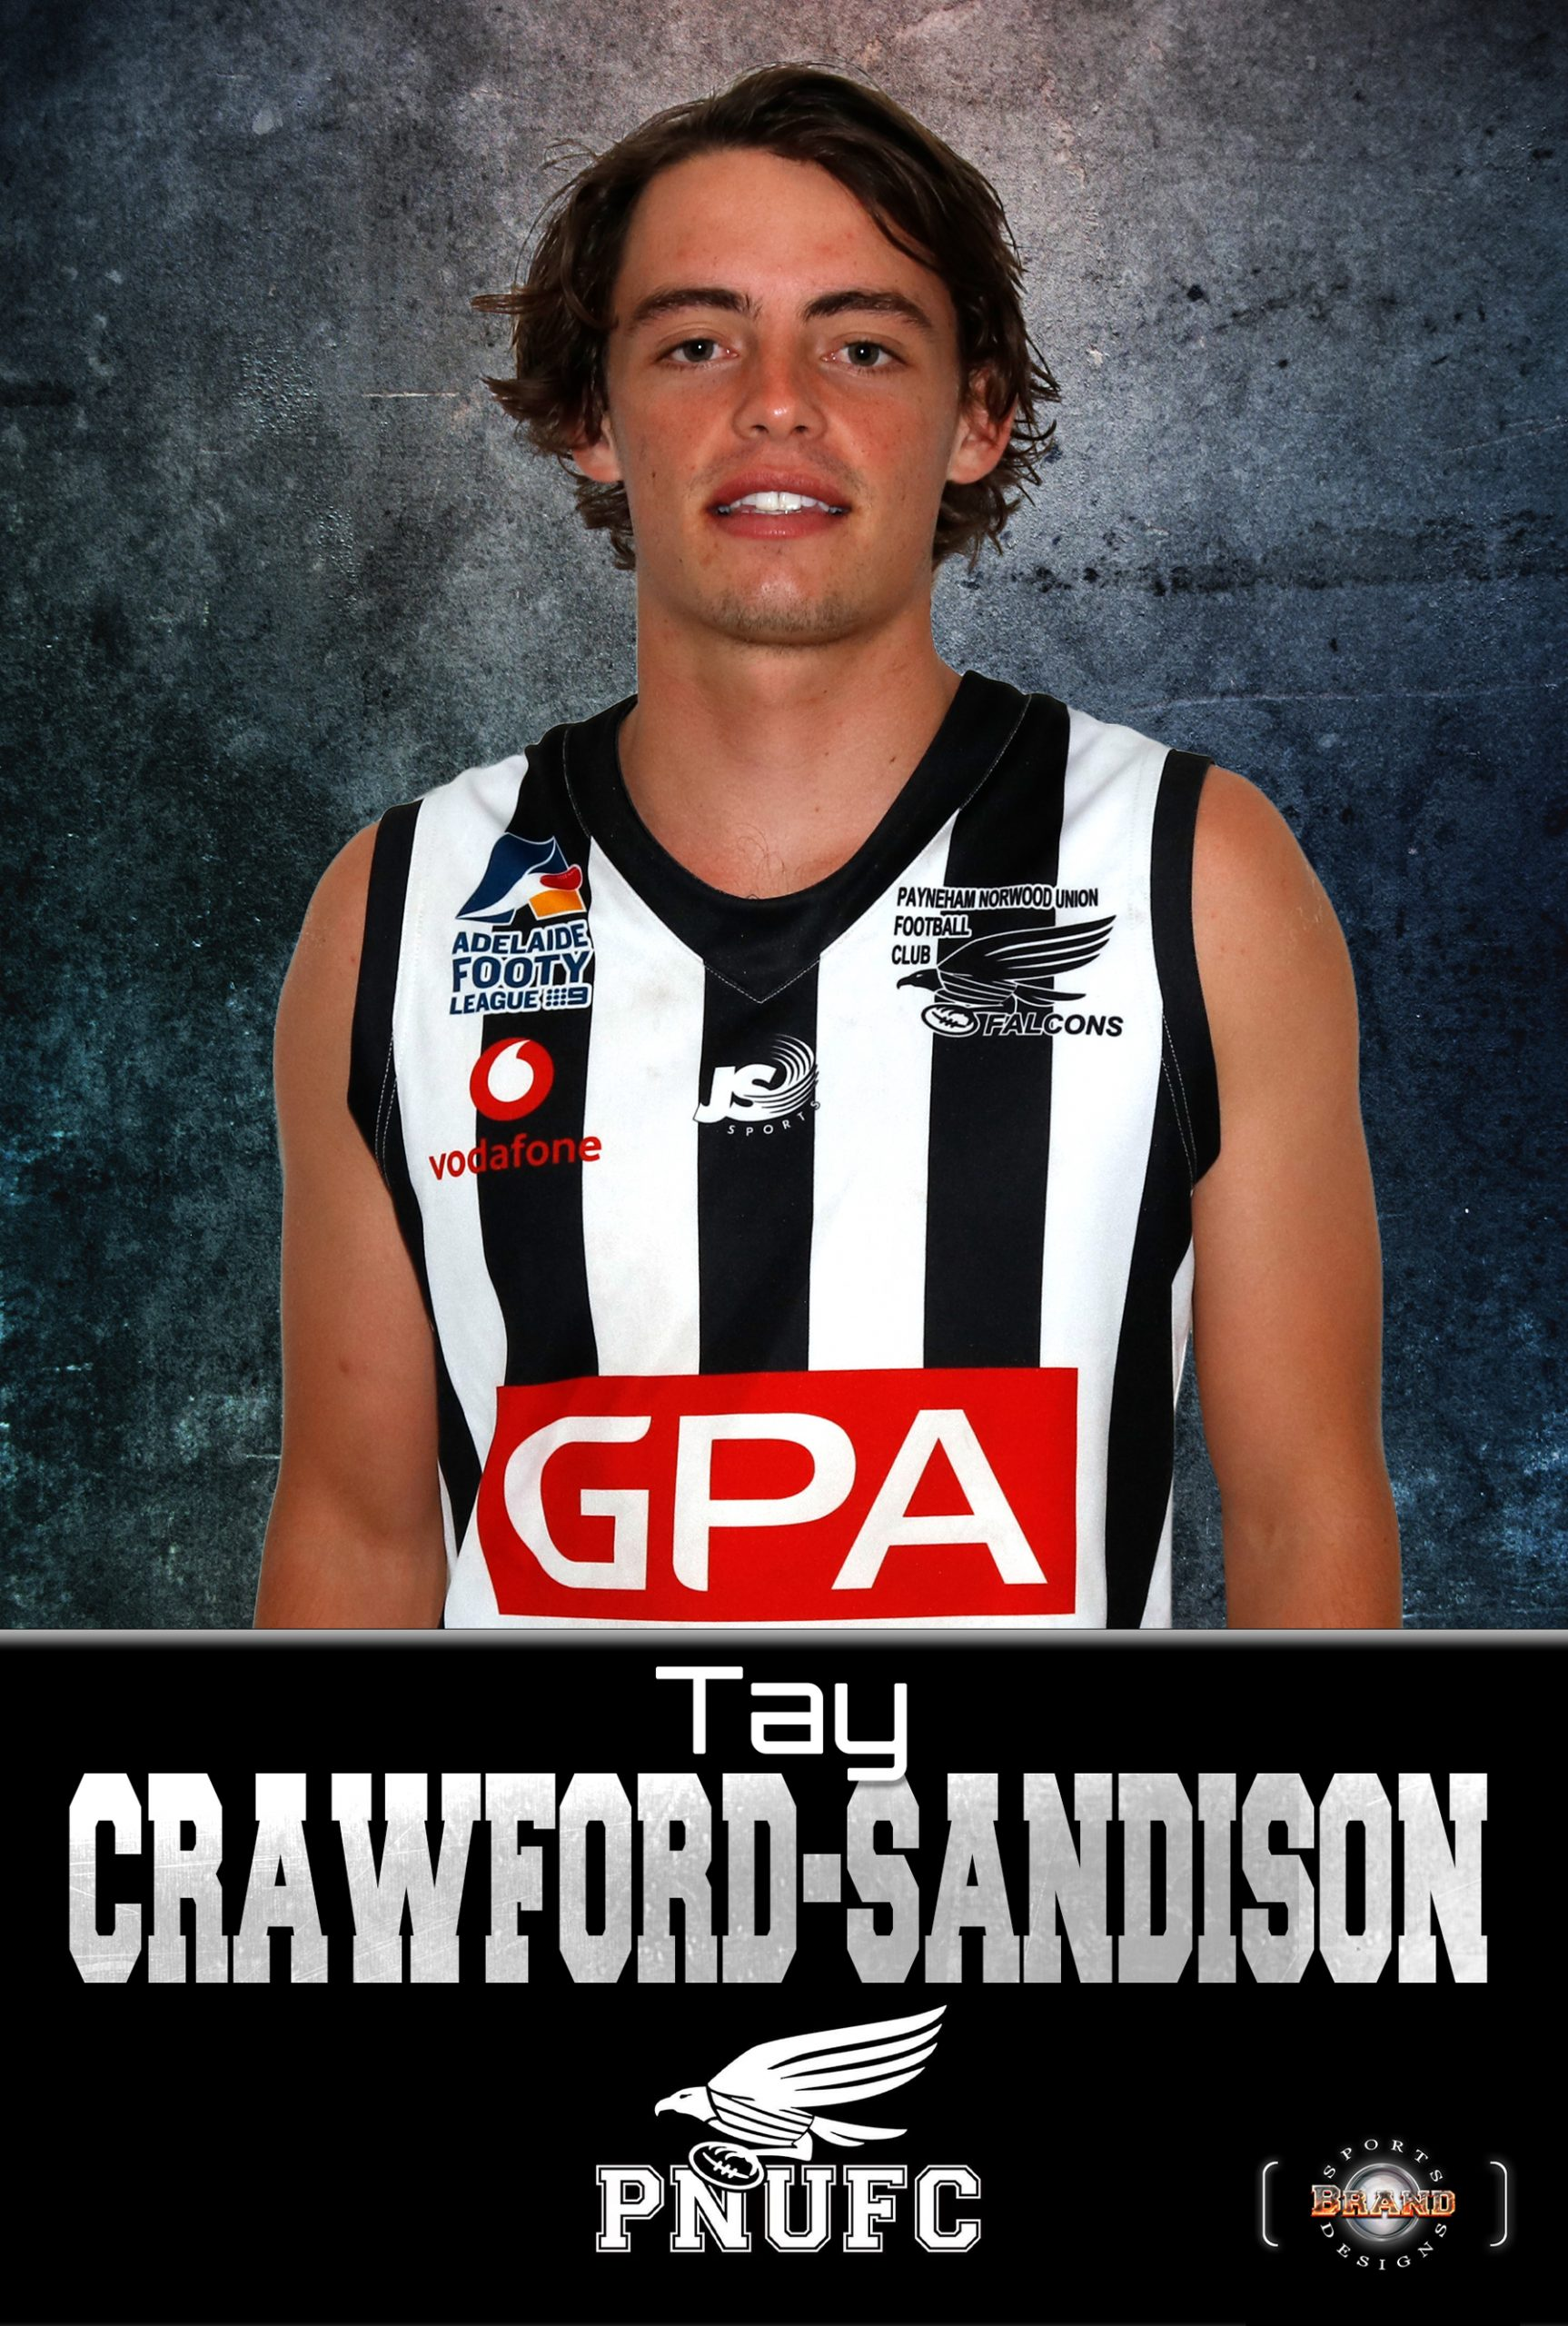 Tay Crawford-Sandison